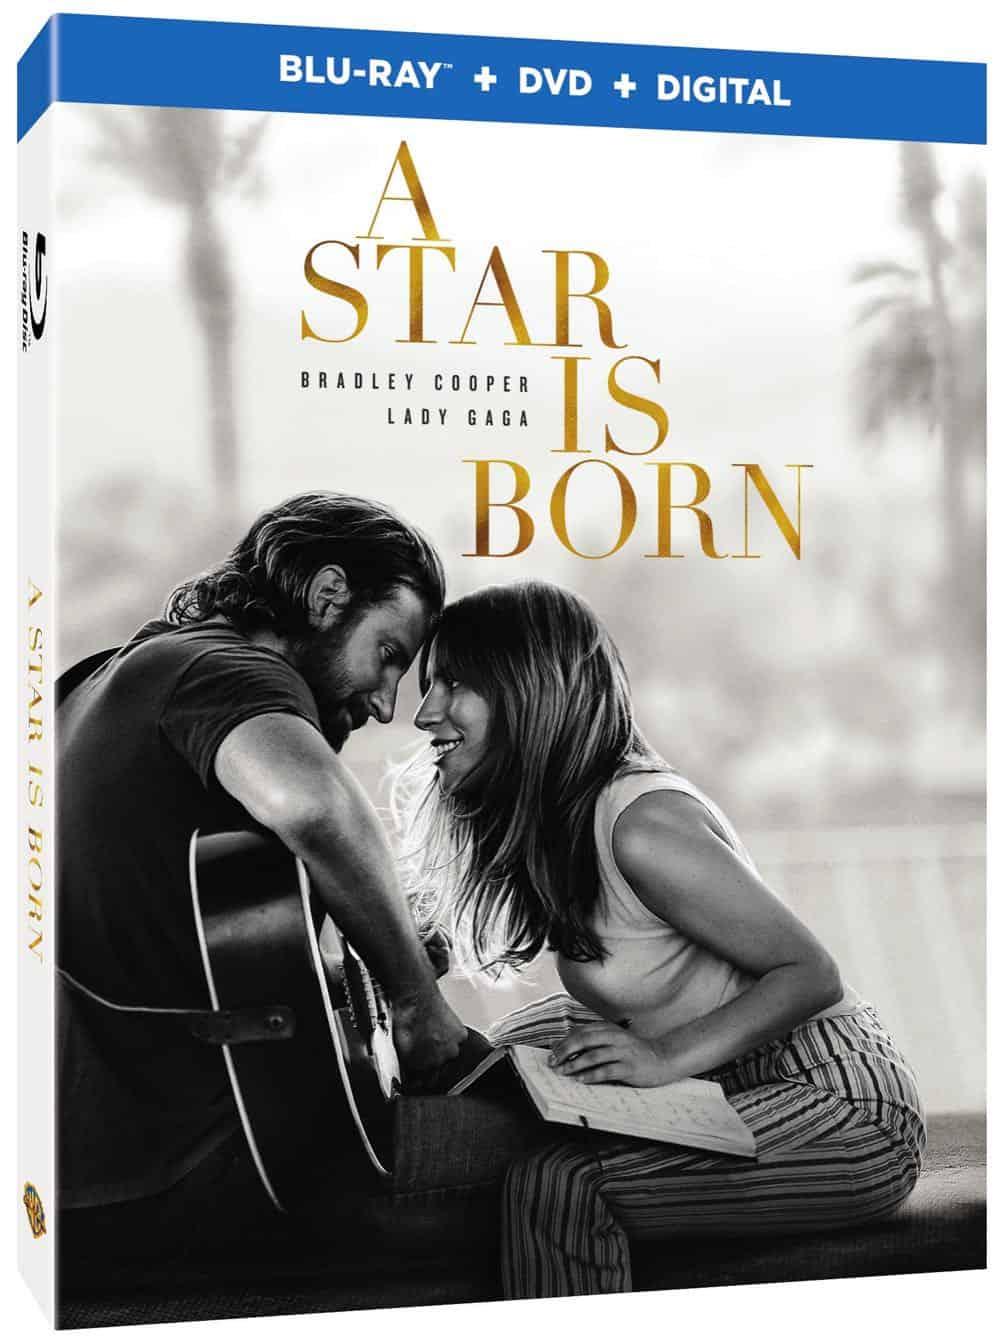 A Star Is Born Bluray 1